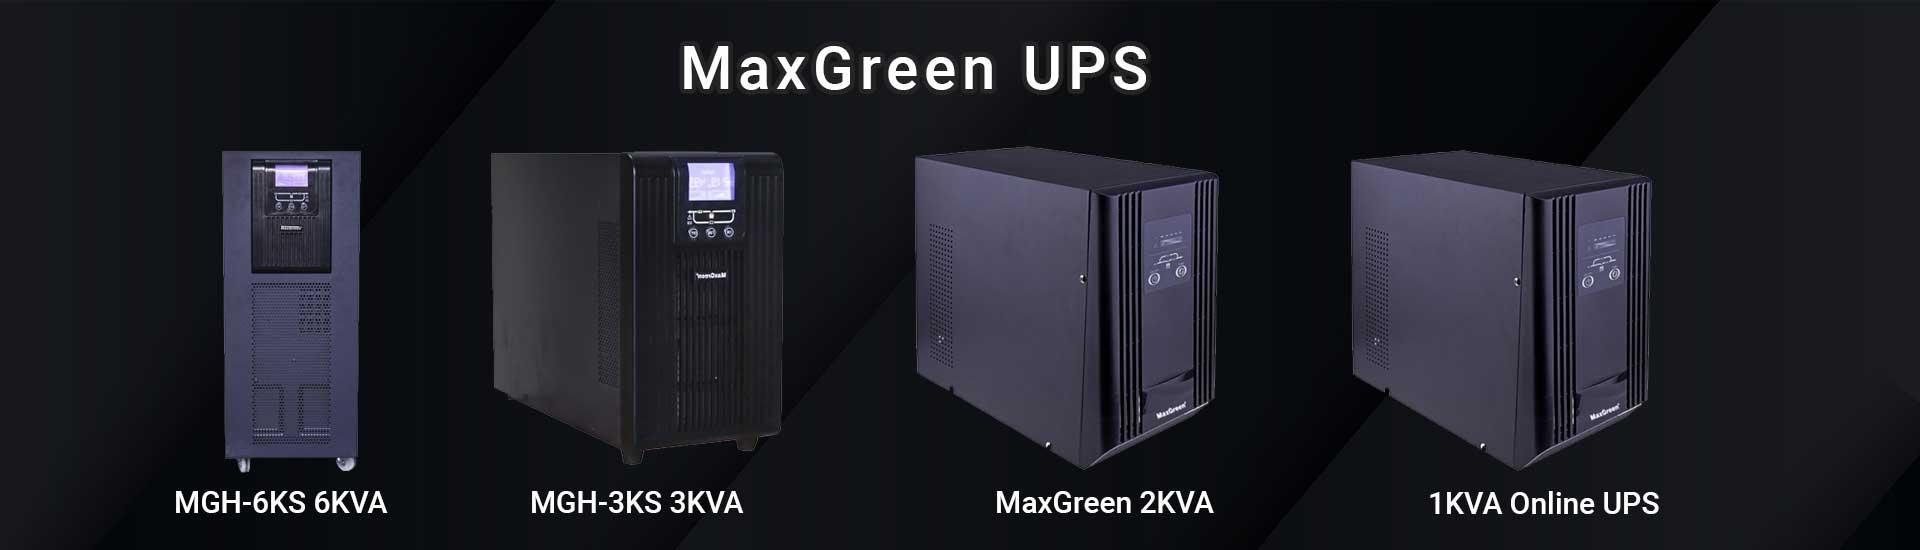 MaxGreen UPS